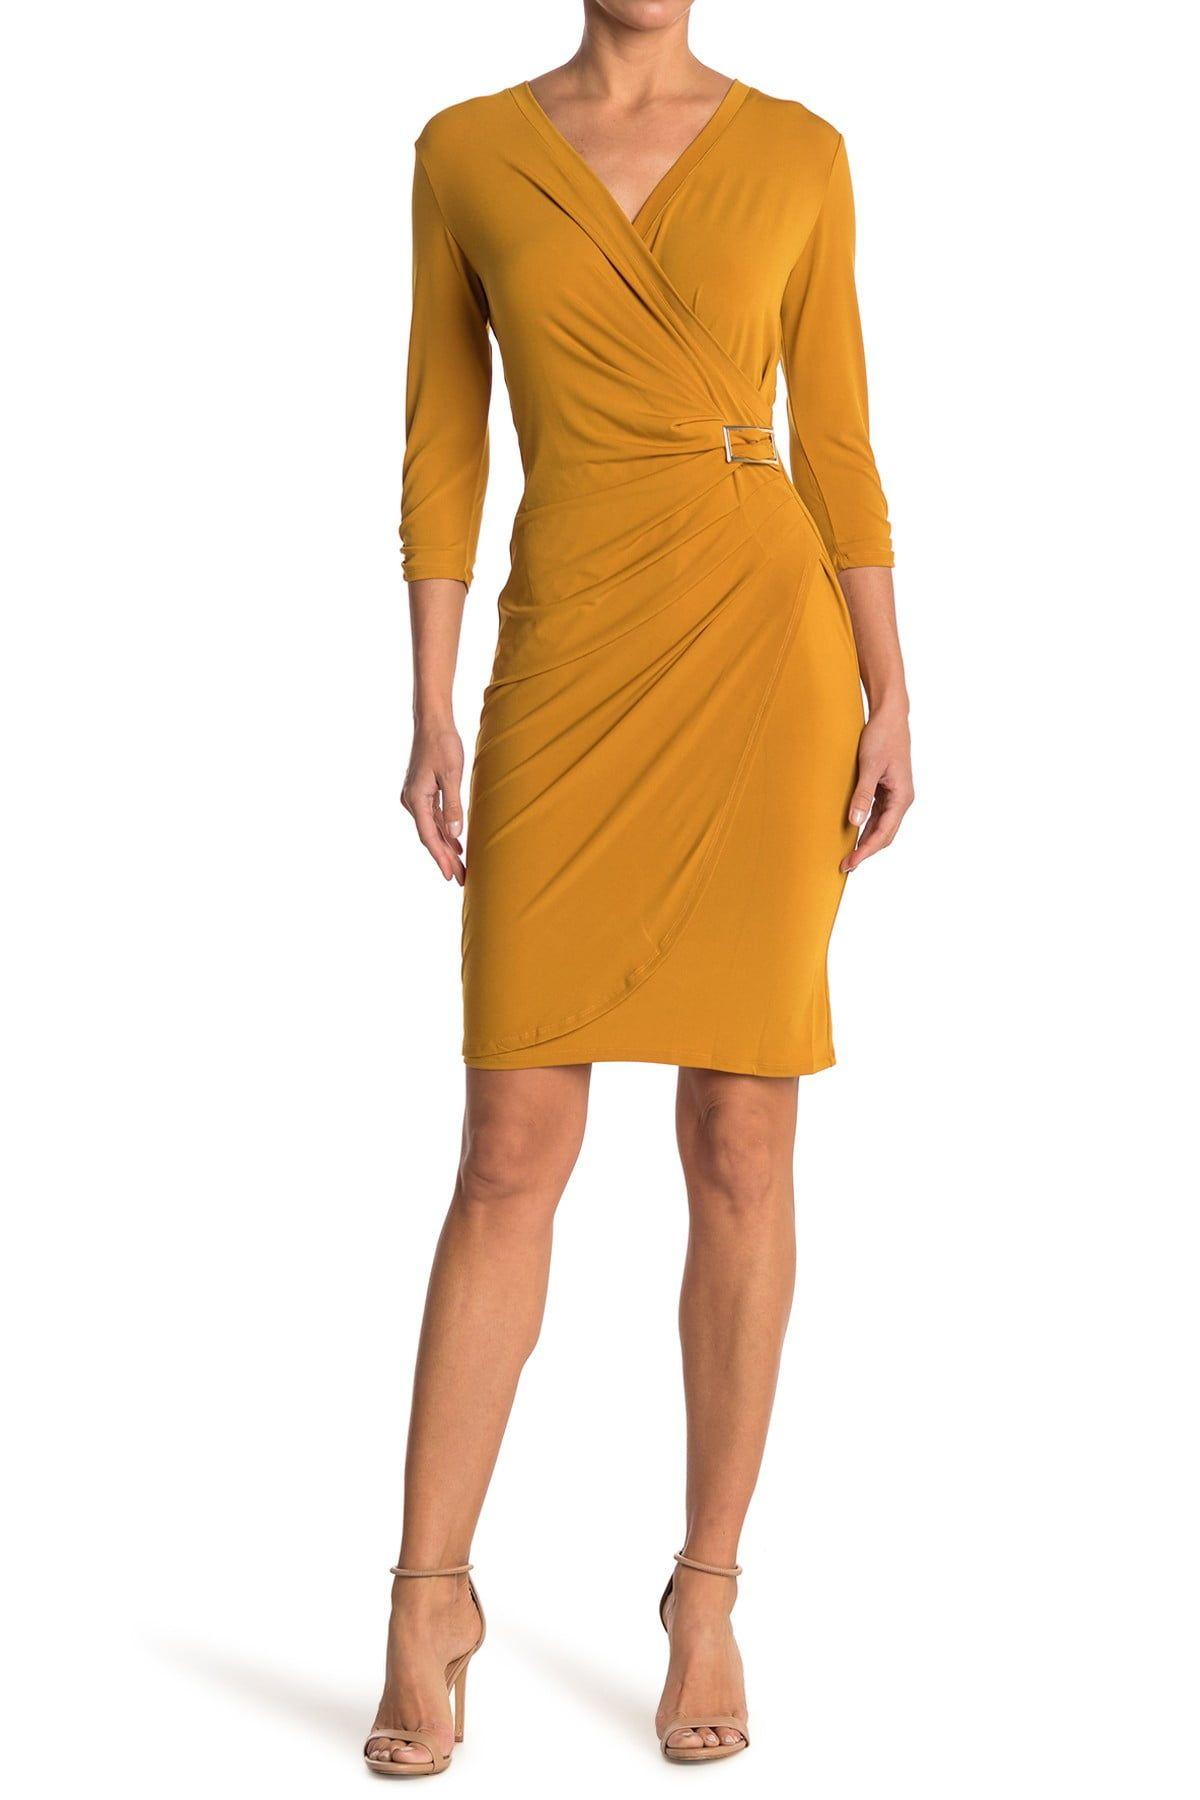 T Tahari Wrap Midi Dress Nordstrom Rack Midi Dress Nordstrom Dresses Dresses [ 1800 x 1200 Pixel ]